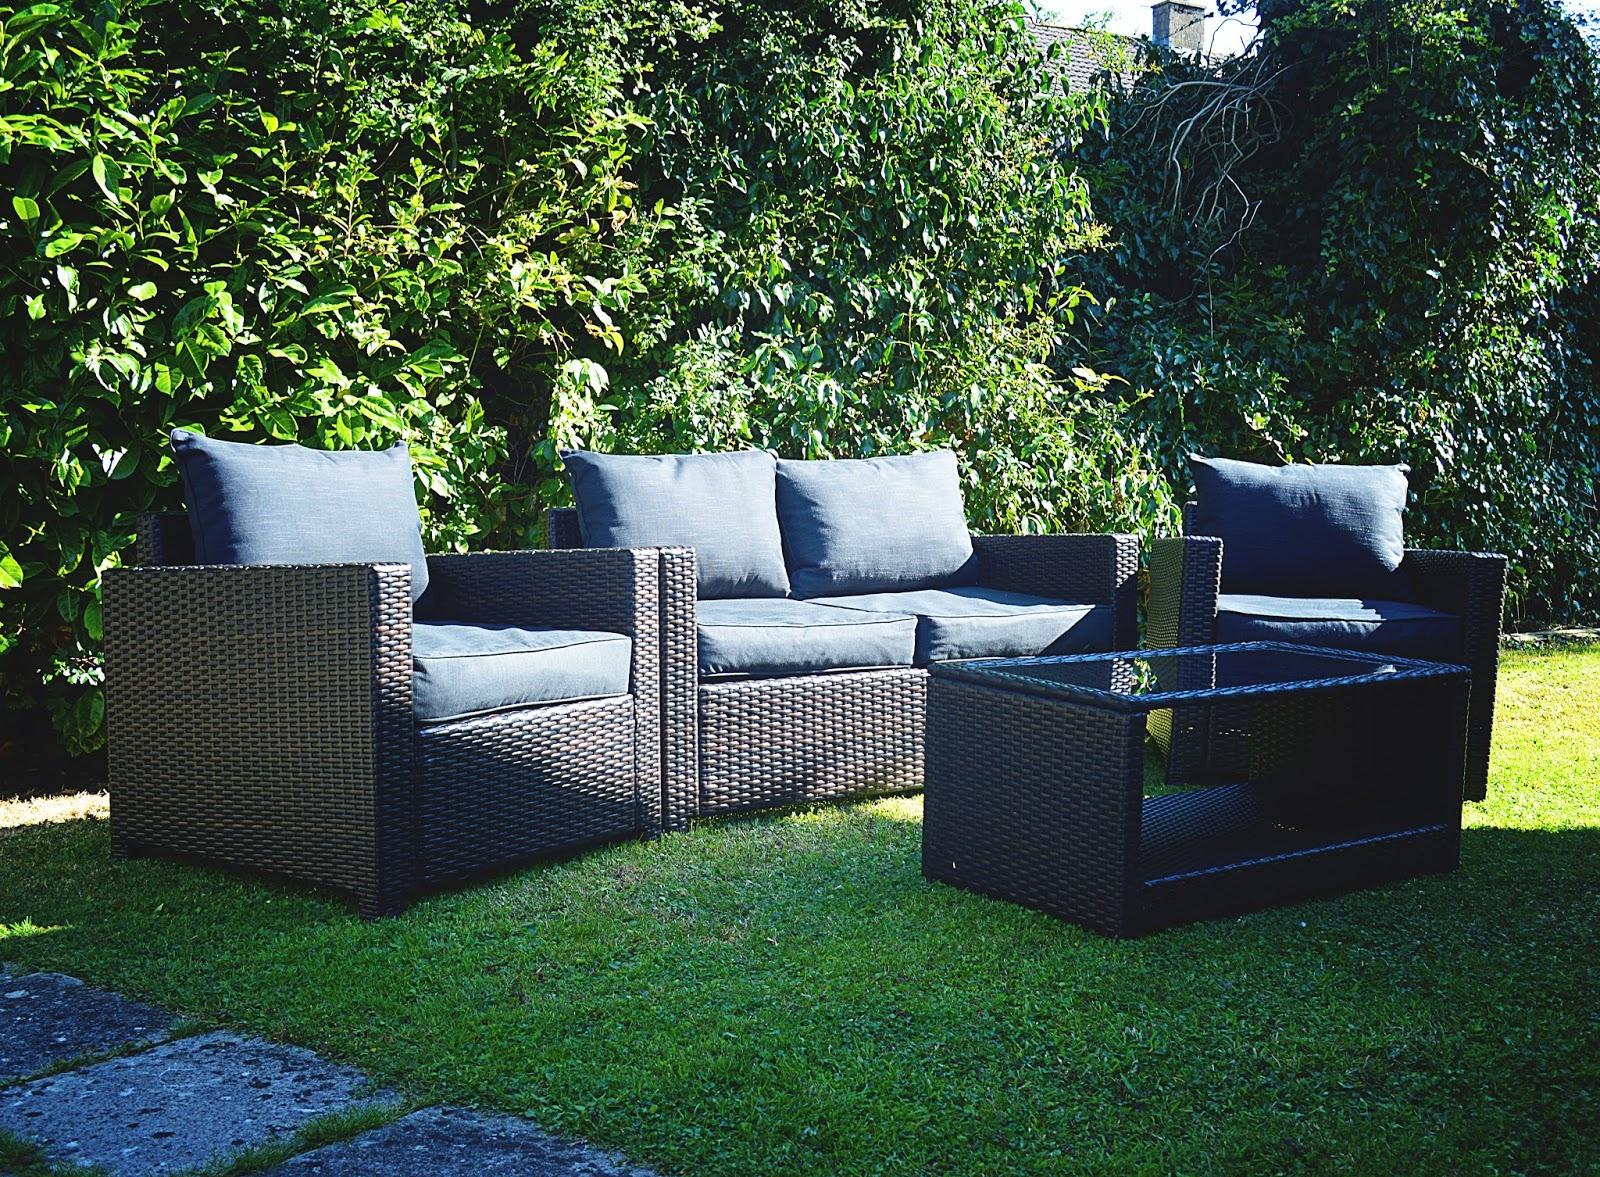 conversation sofas reviews cane sofa set olx pune review jakarta the lifestyle lens